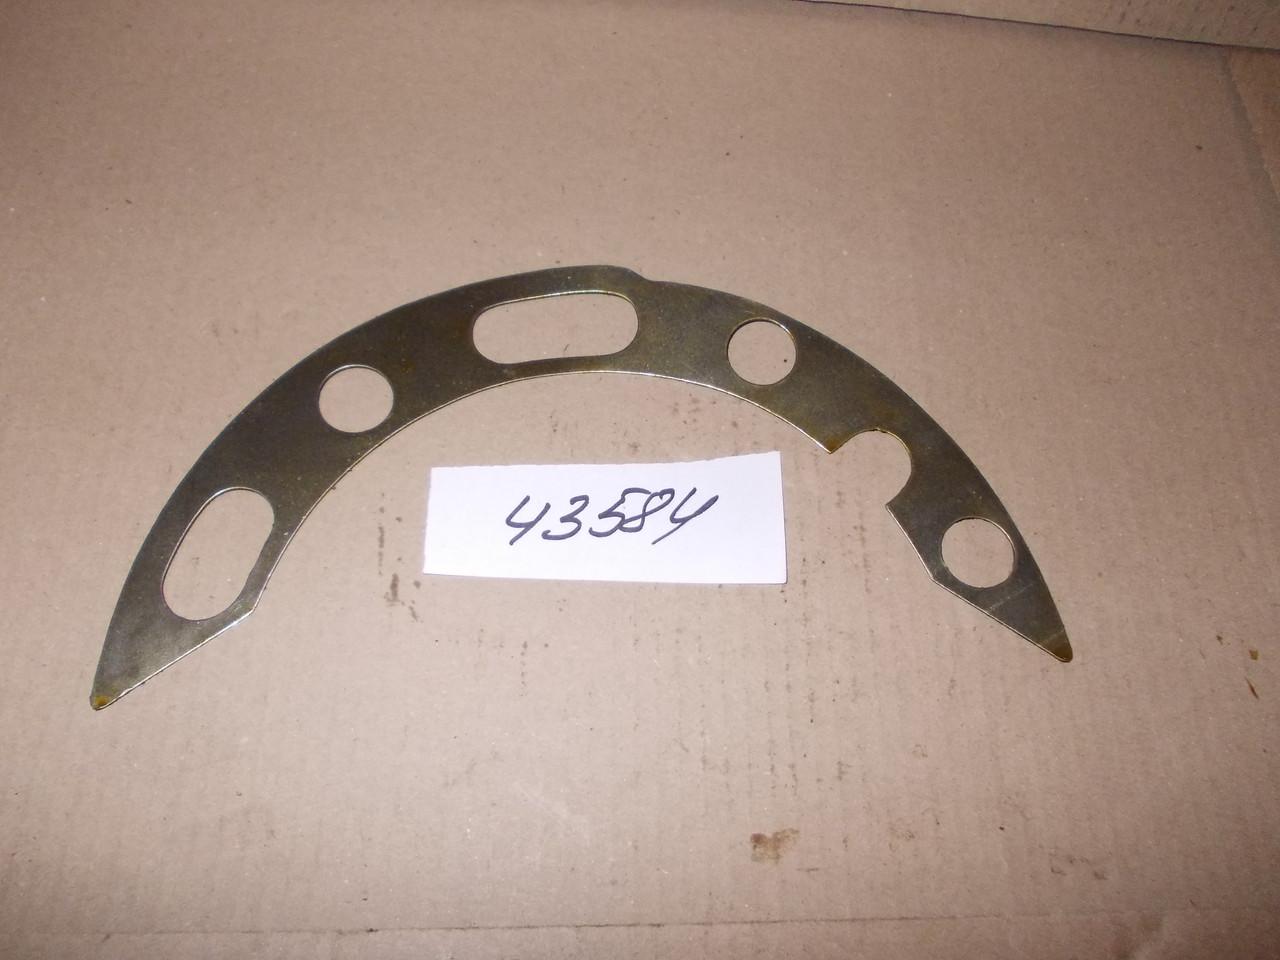 Прокладка регулировочная переднего моста (дифференциала) МТЗ-82-1523 (0,2 мм.); 52-2303028